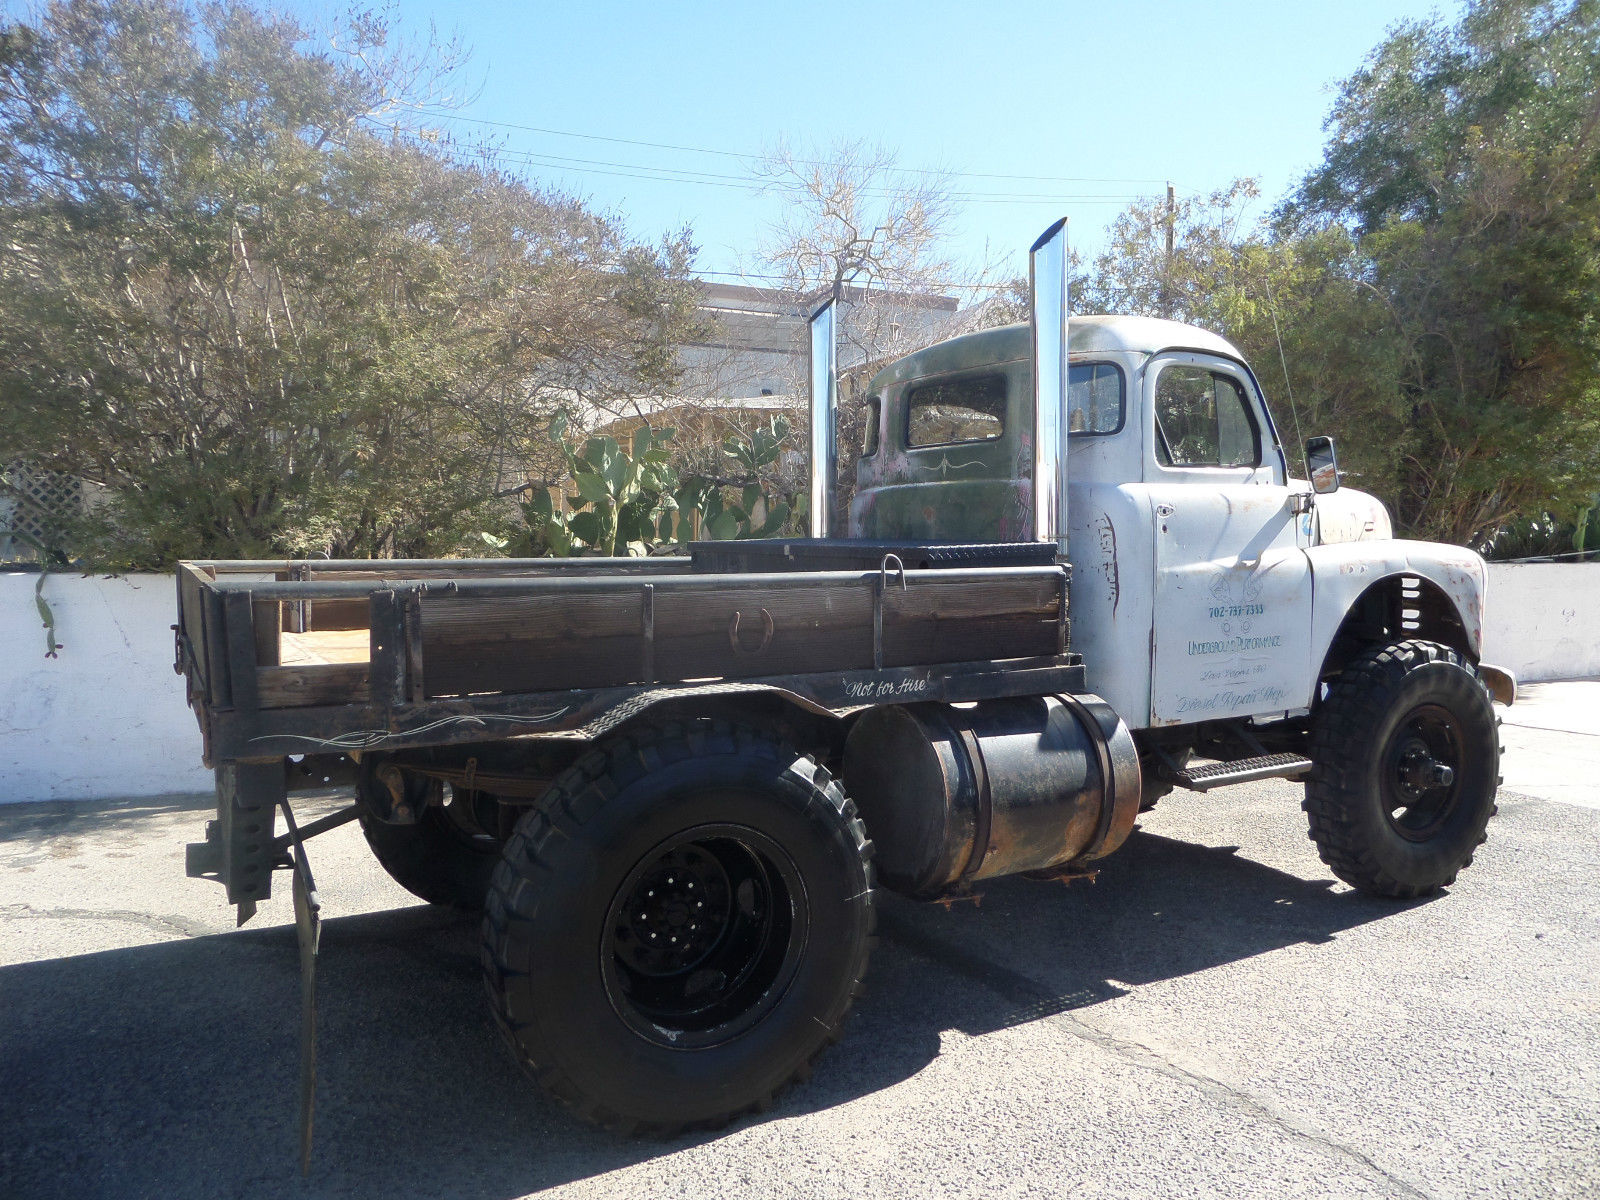 1949 Dodge Truck Cummins Diesel Power 4x4 Rat Rod Tow No Reserve Pickup